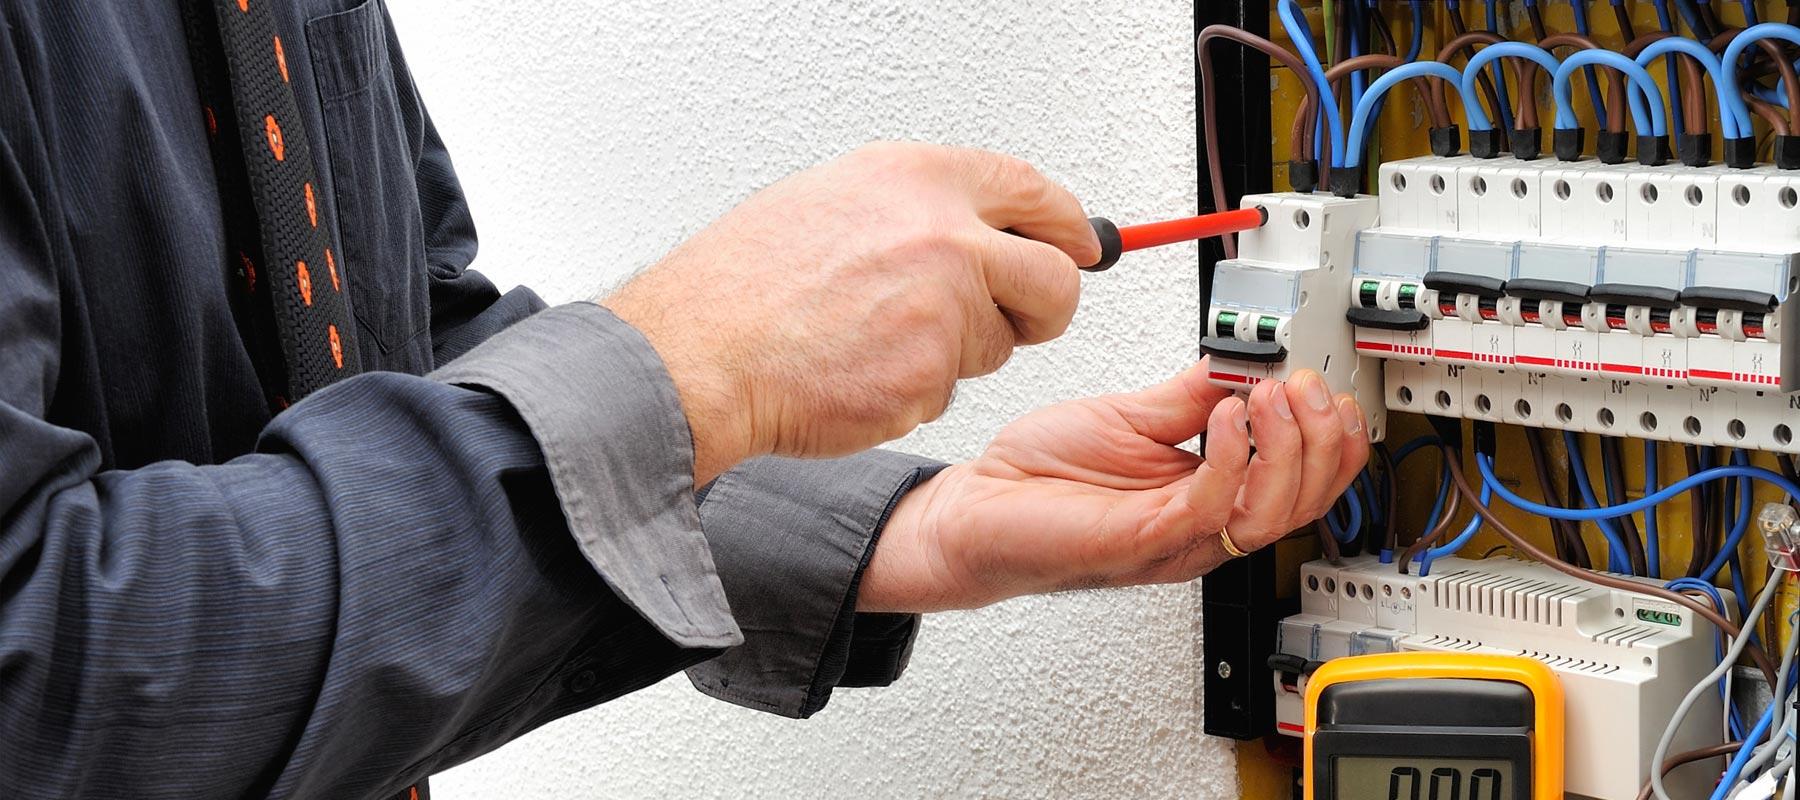 Electrical Repair Services Santa Ana | US Electrical